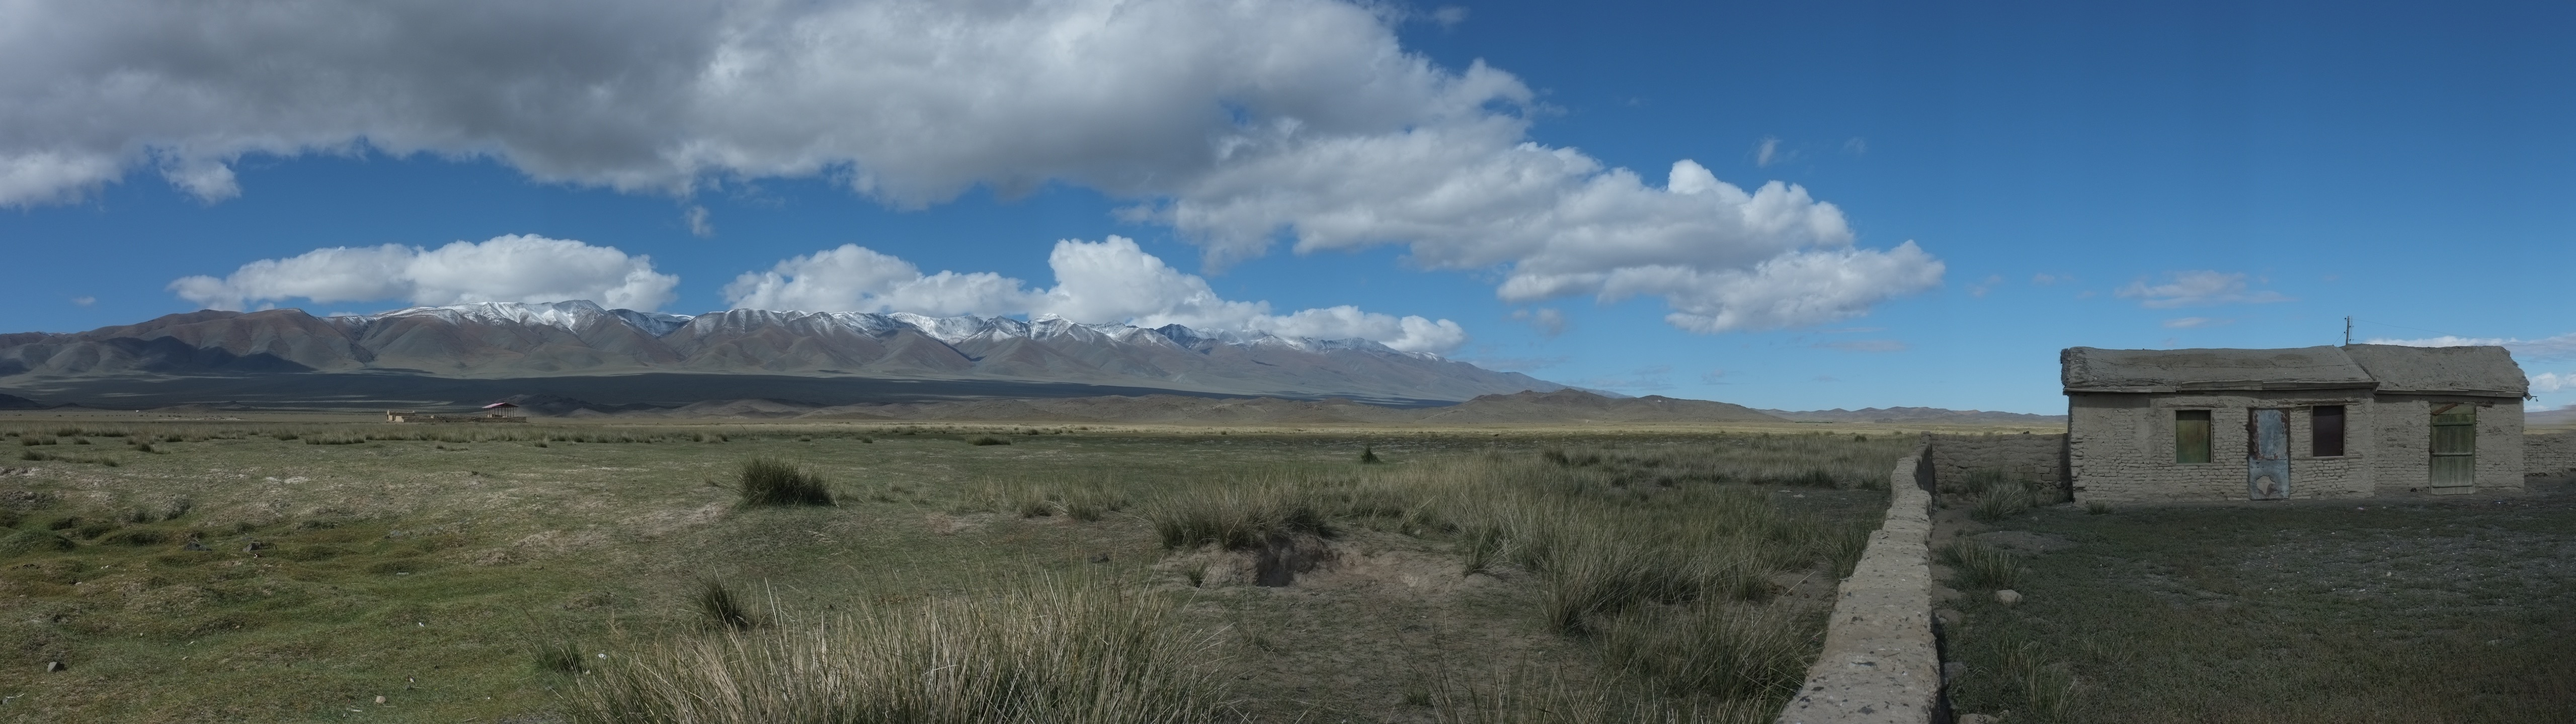 Chaîne de l'Altai